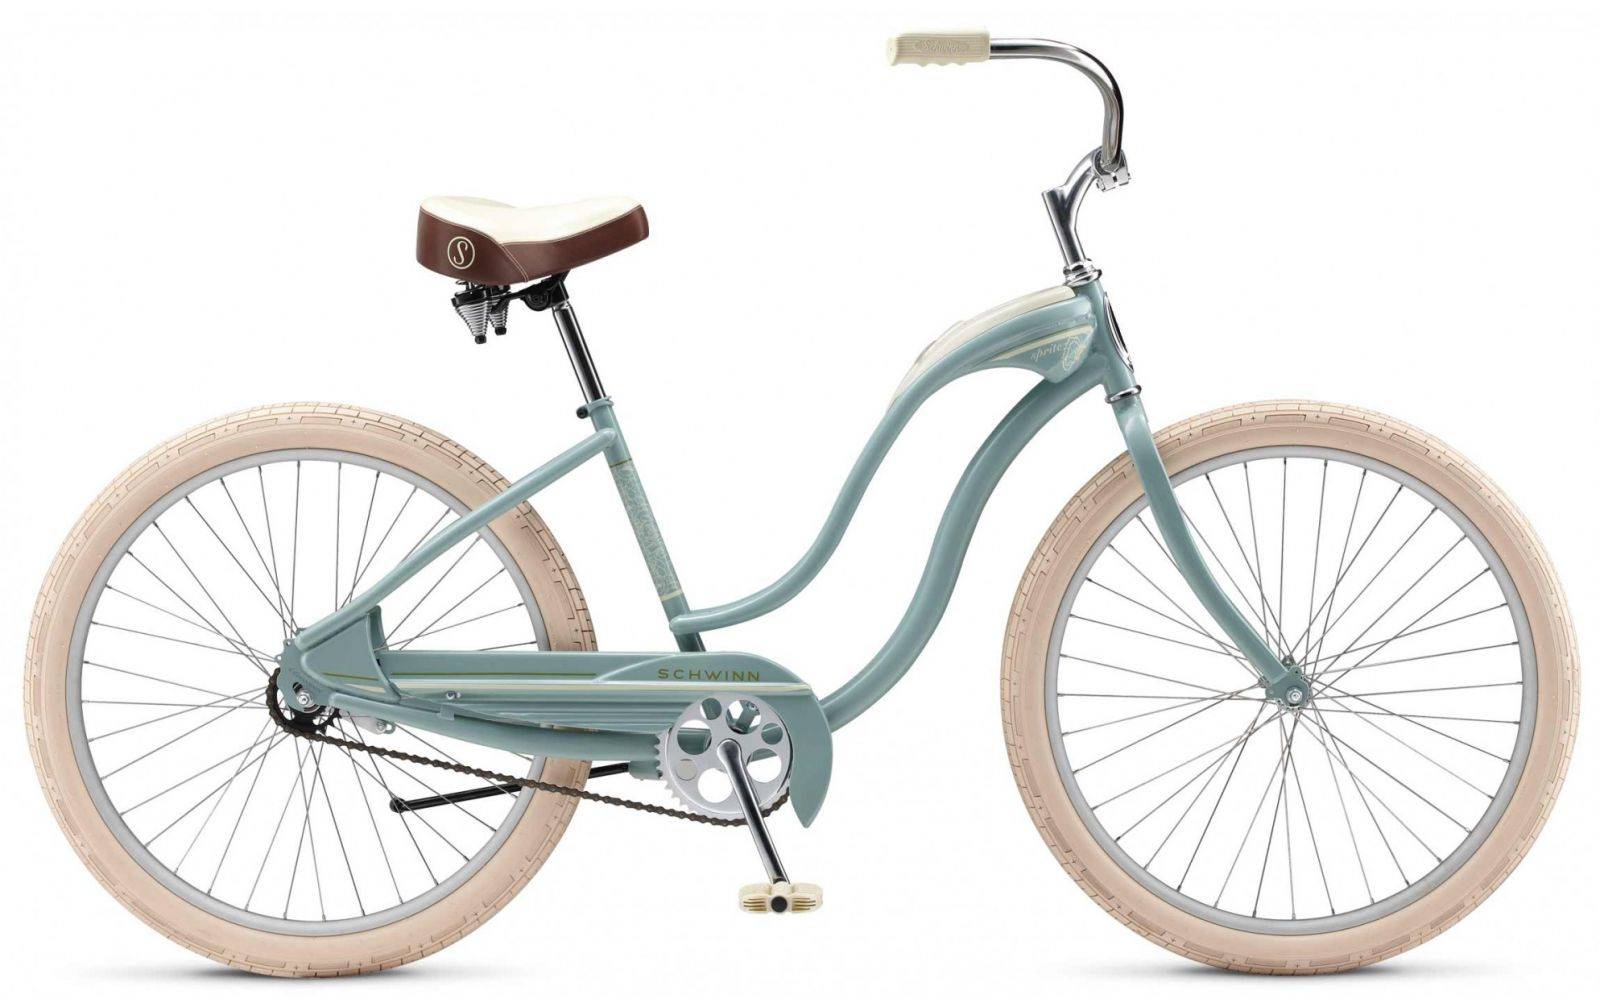 Секс на седле велосипеда 26 фотография